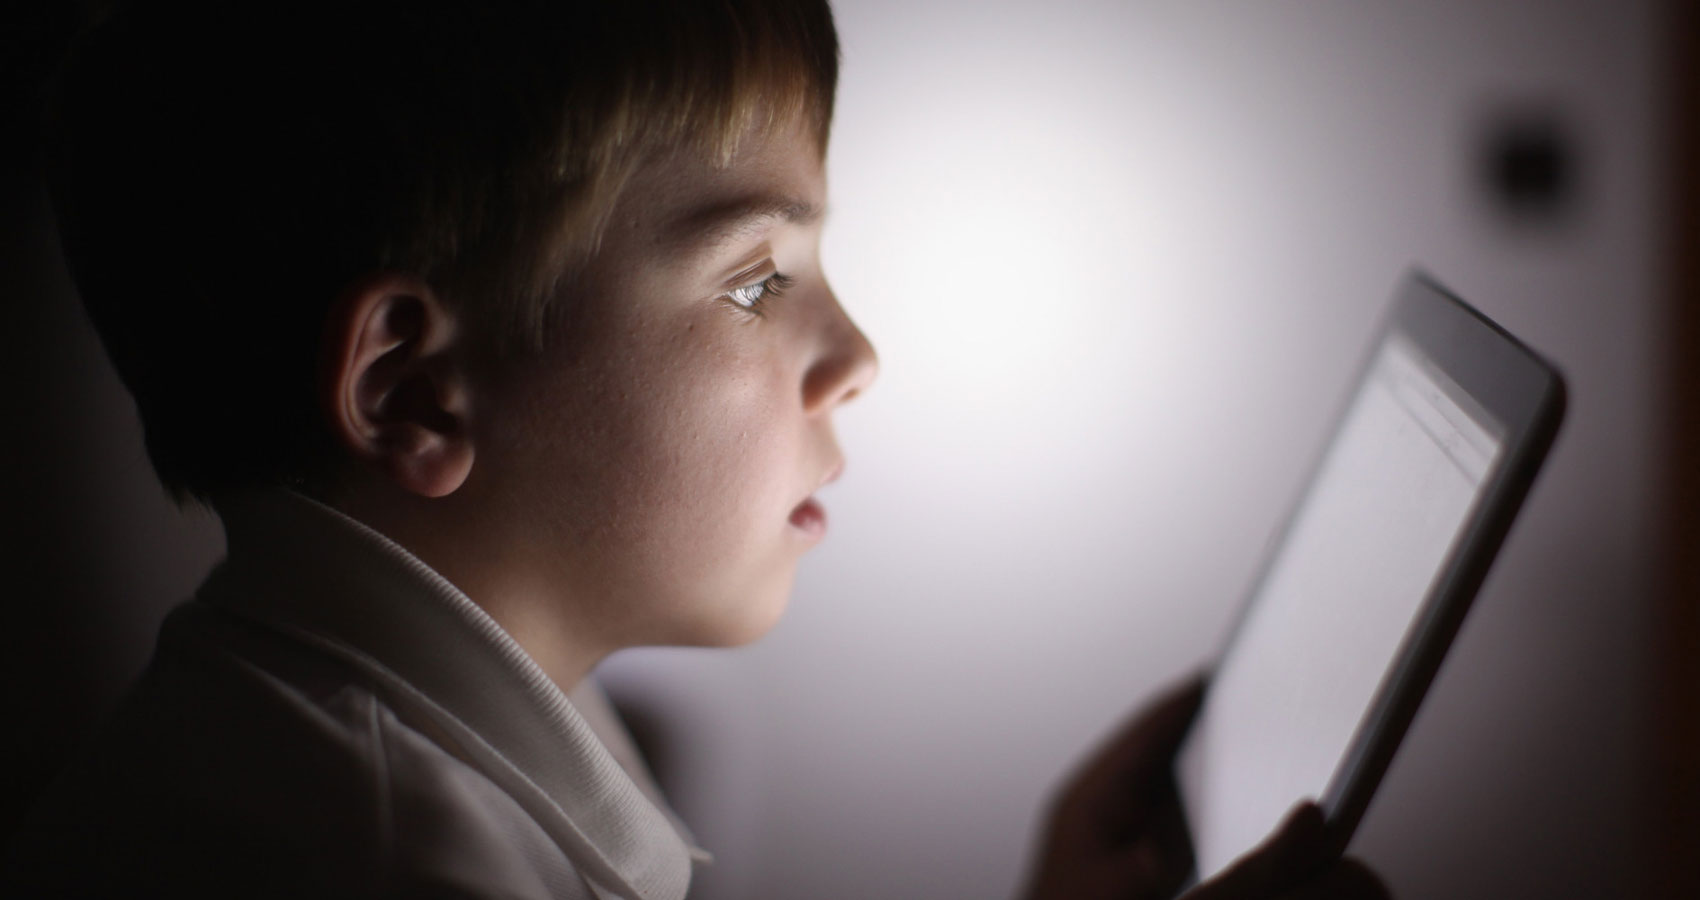 A Stolen Childhood by Poetanp at Spillwords.com